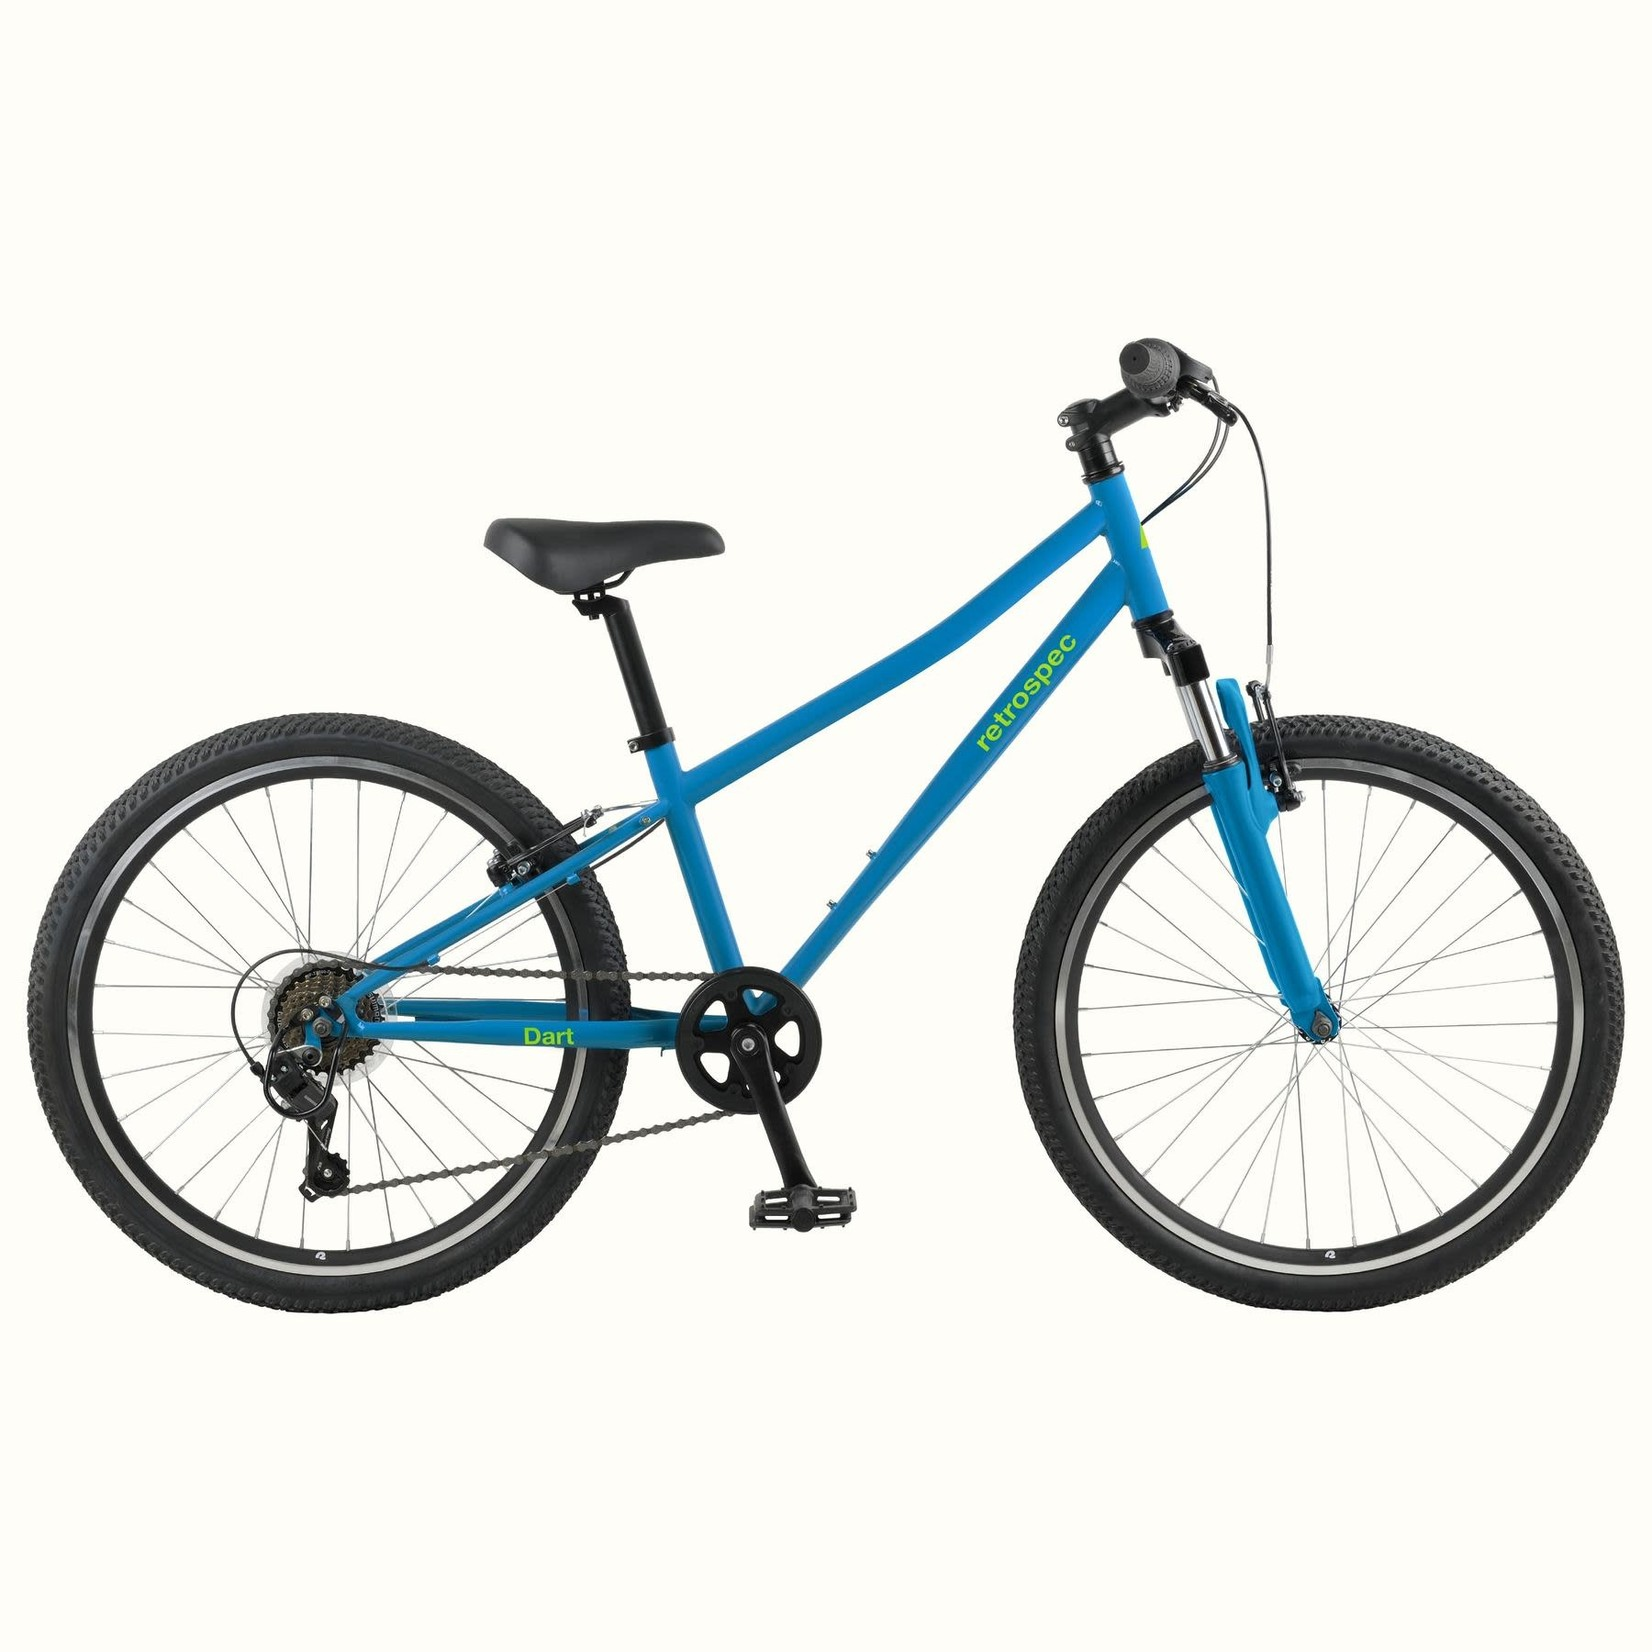 "Retrospec Dart 24"" Kids Bike - 7 Speed"